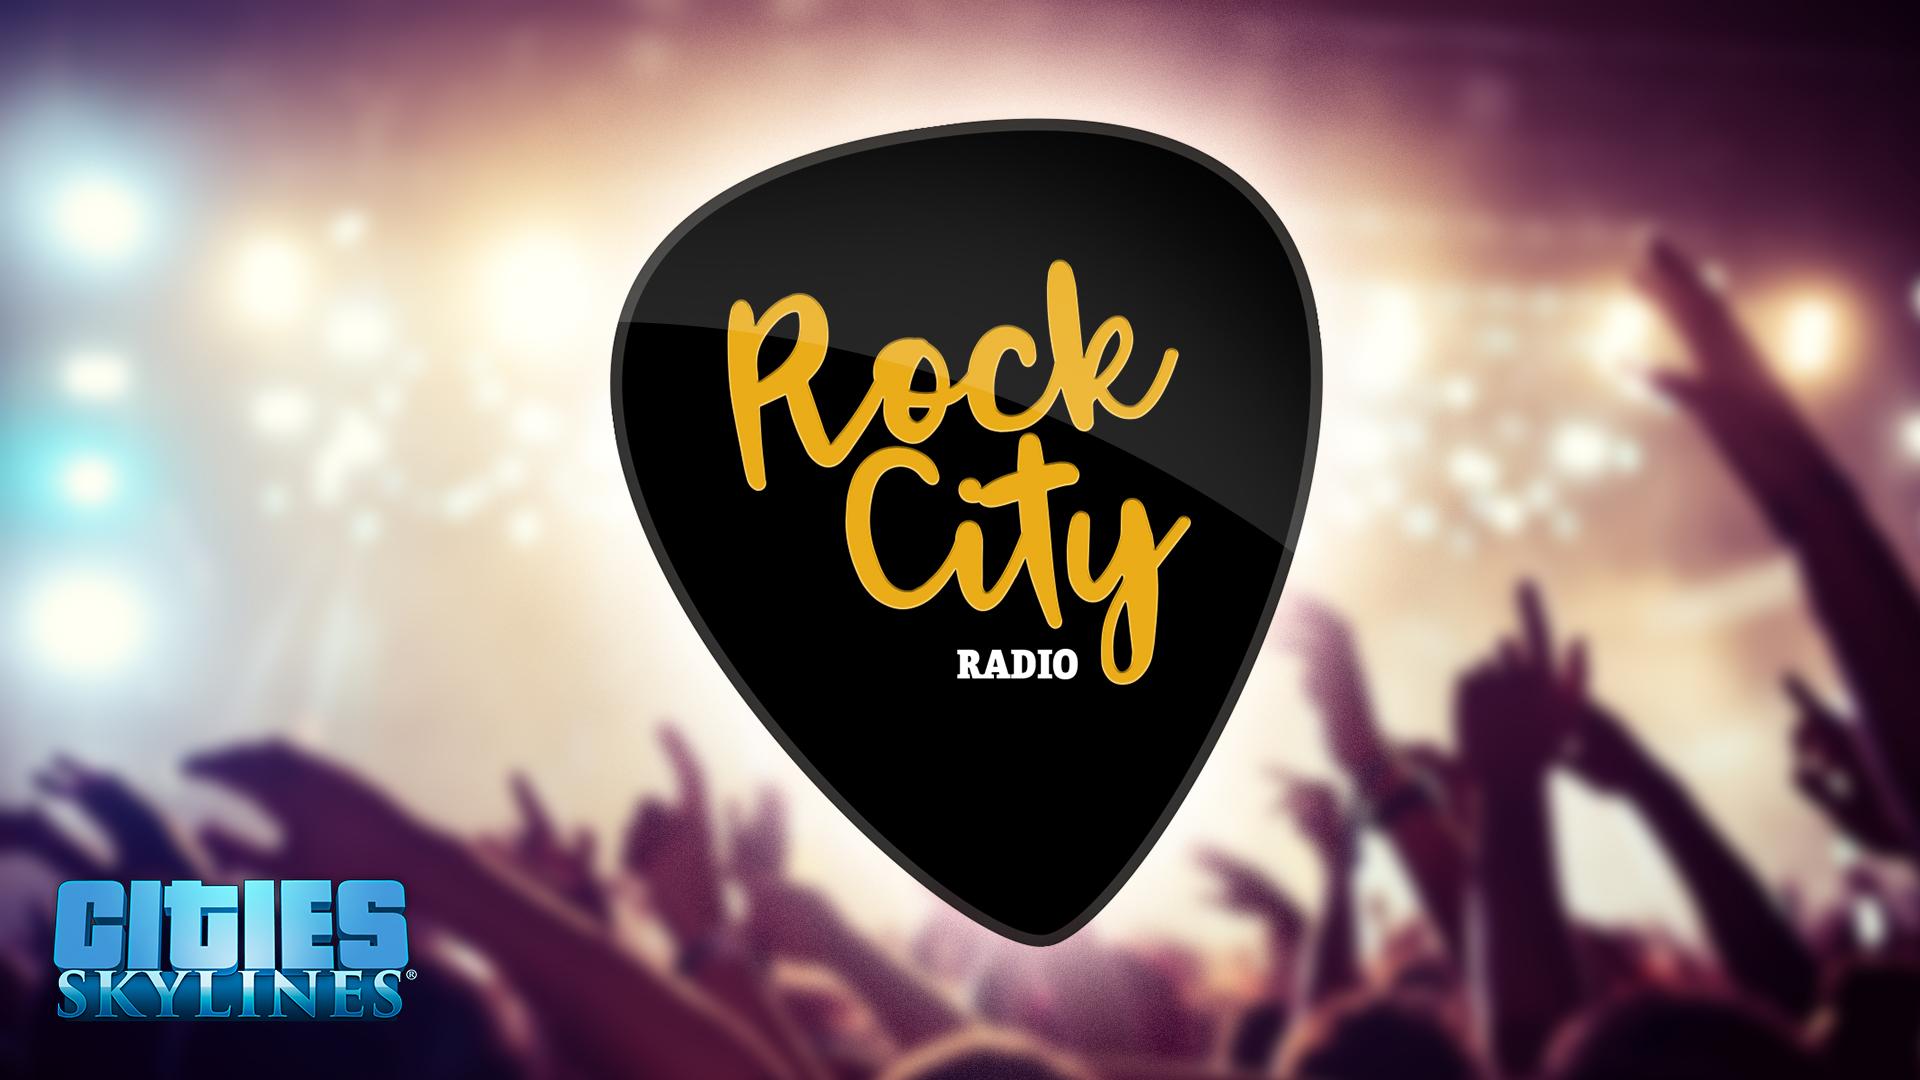 Cities: Skylines - Rock City Radio game image